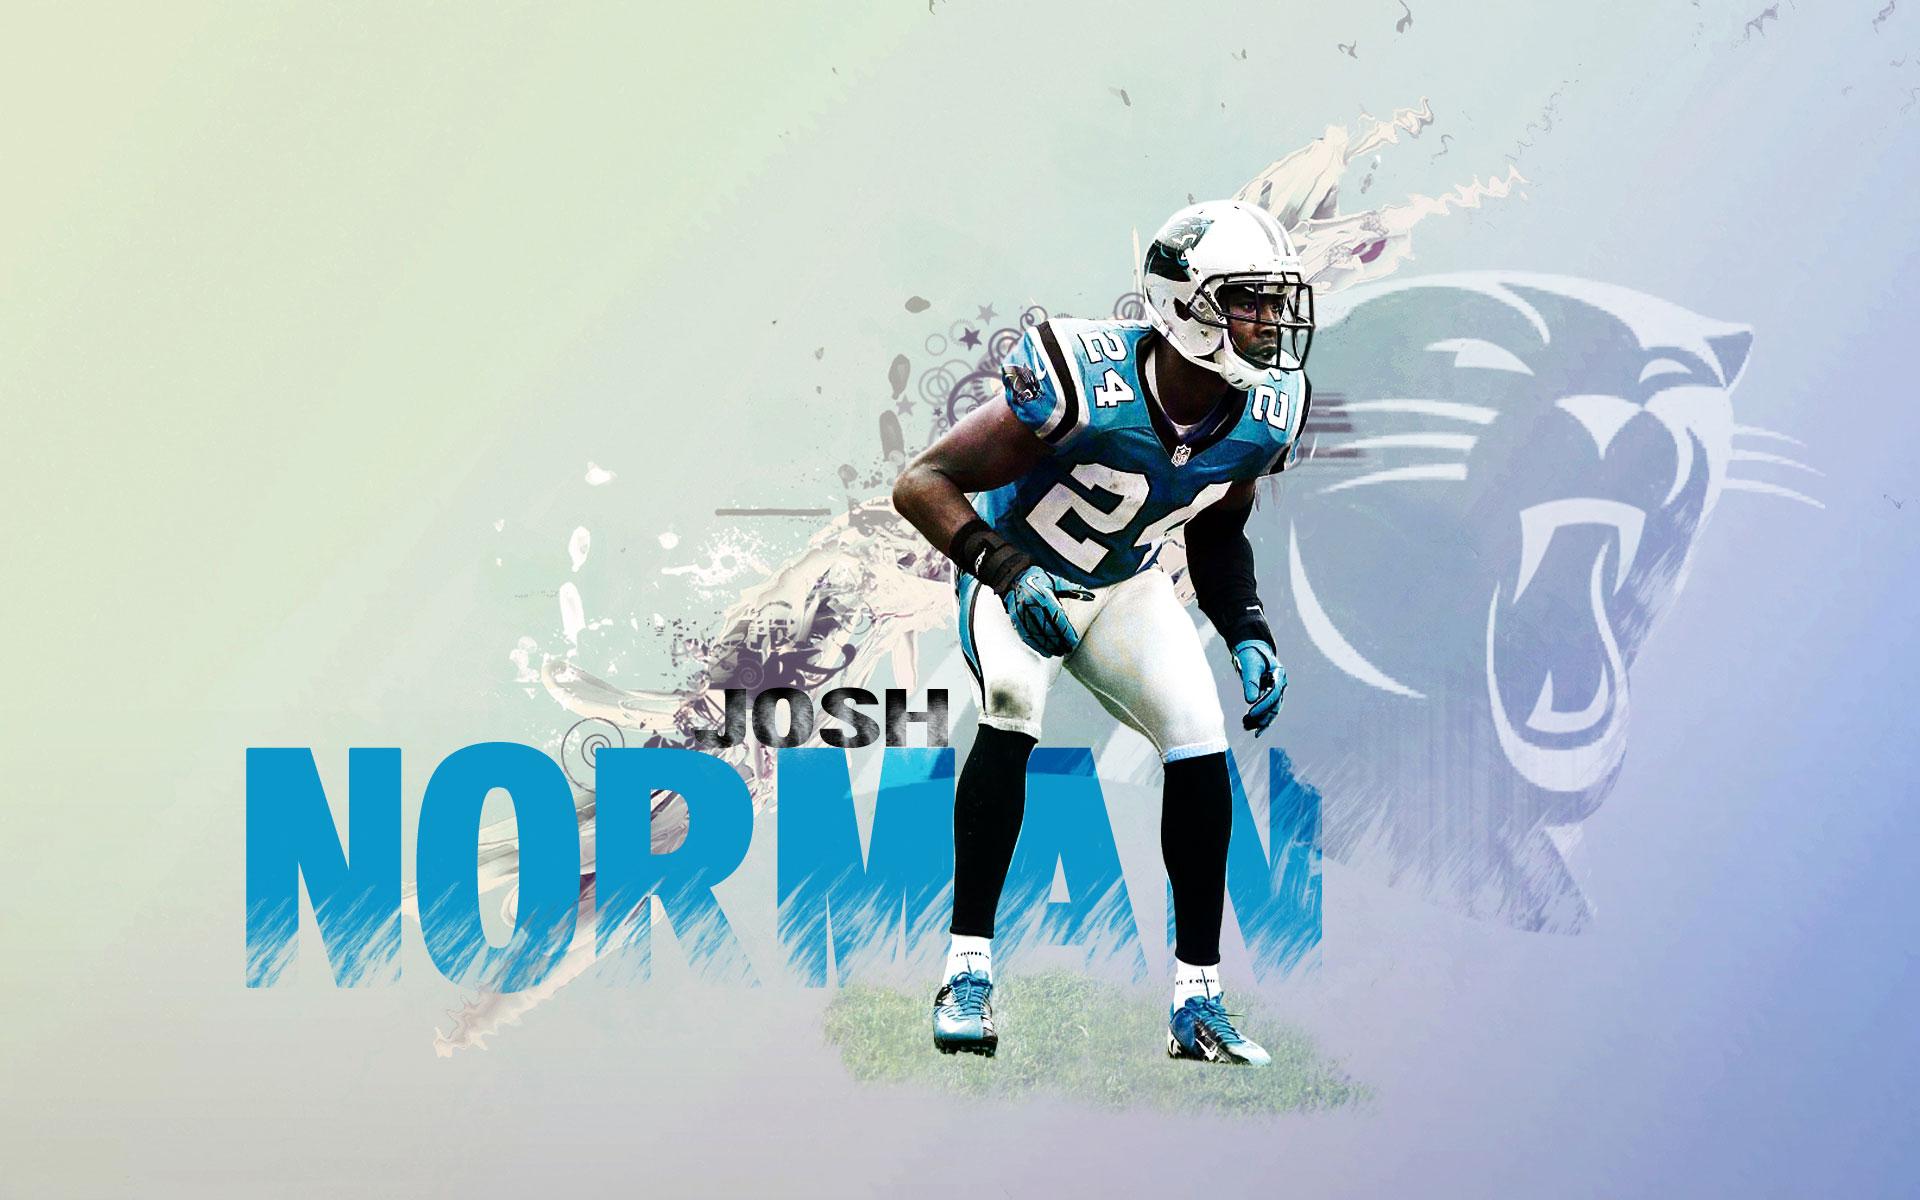 Wallpapers   Josh Norman Carolina Panthers 1920x1080 wallpaper 1920x1200